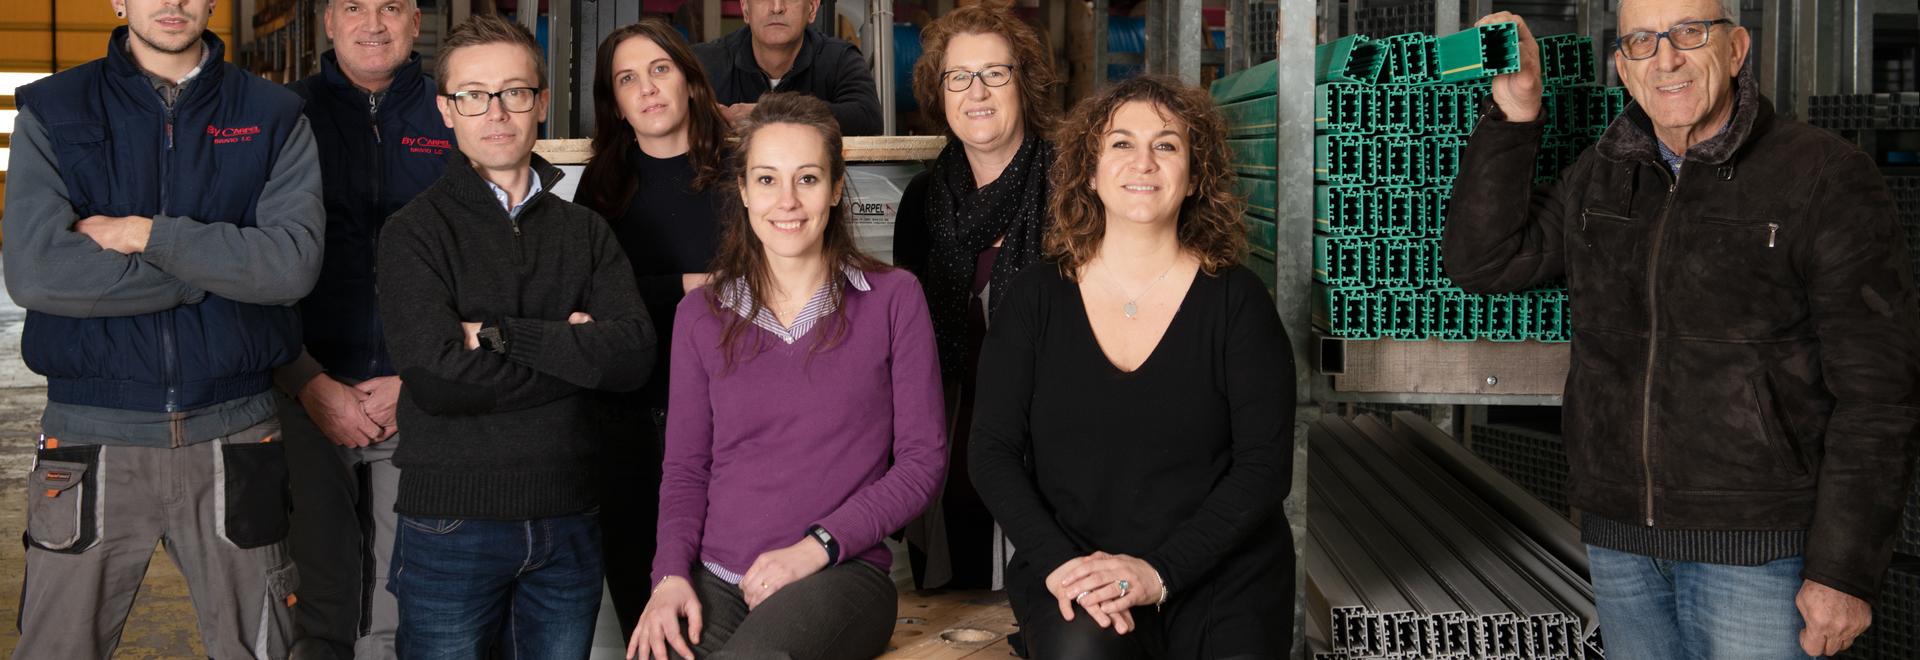 team By Carpel